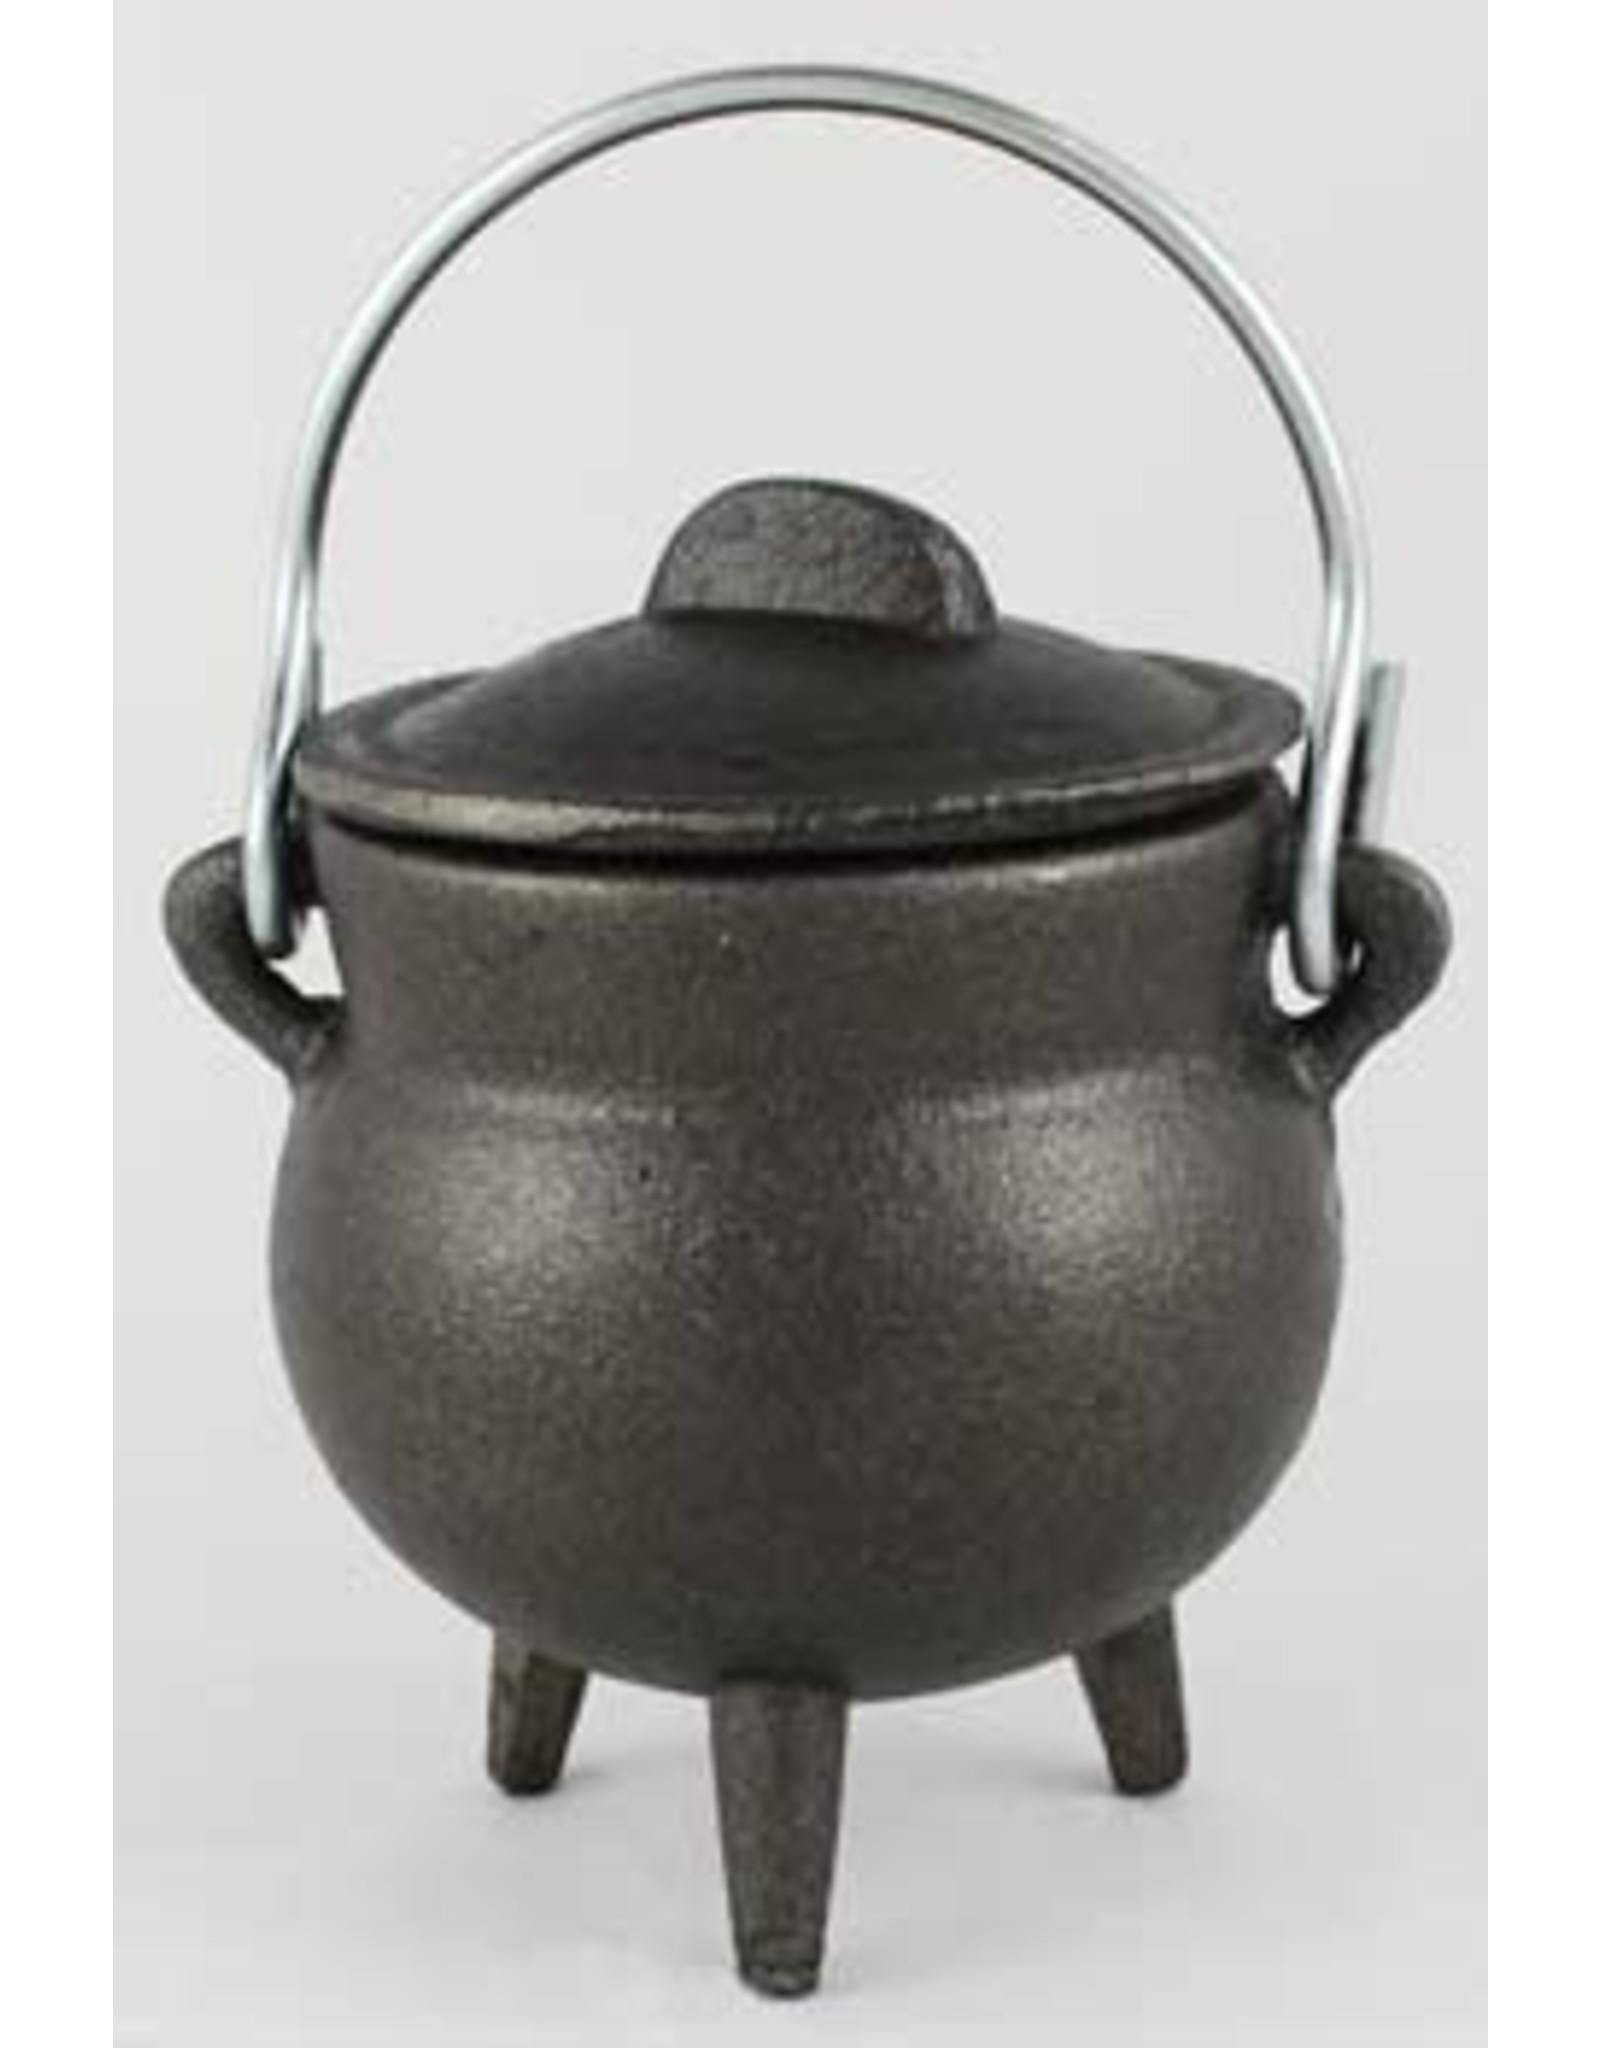 Cast Iron Cauldron 3 inches